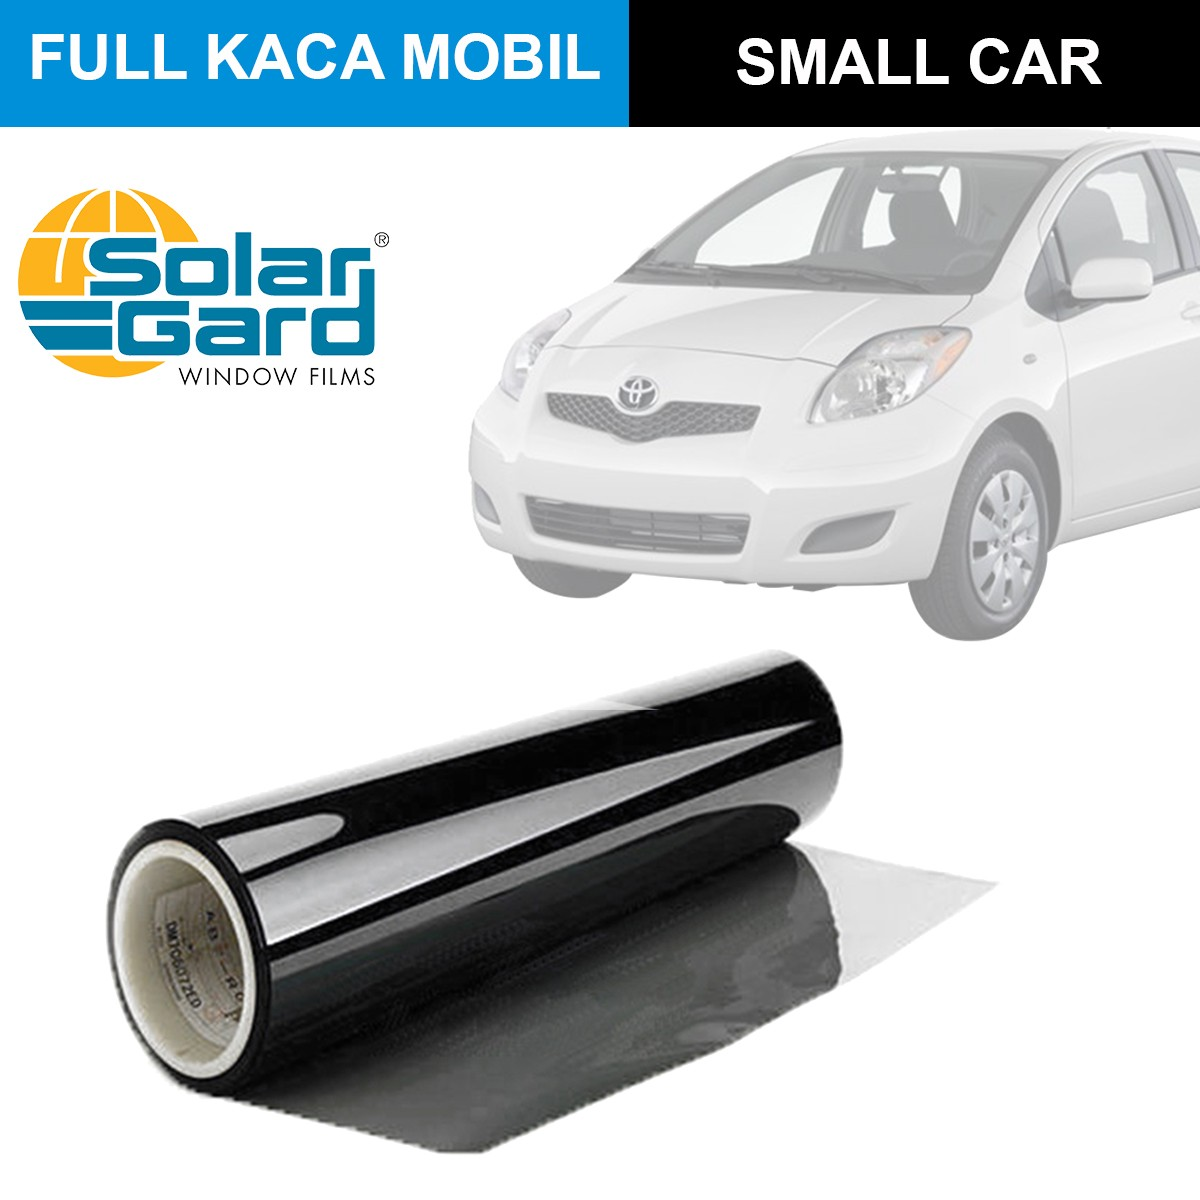 KACA FILM SOLAR GARD KOMBINASI LX + BLACK PHANTOM - (SMALL CAR) FULL KACA